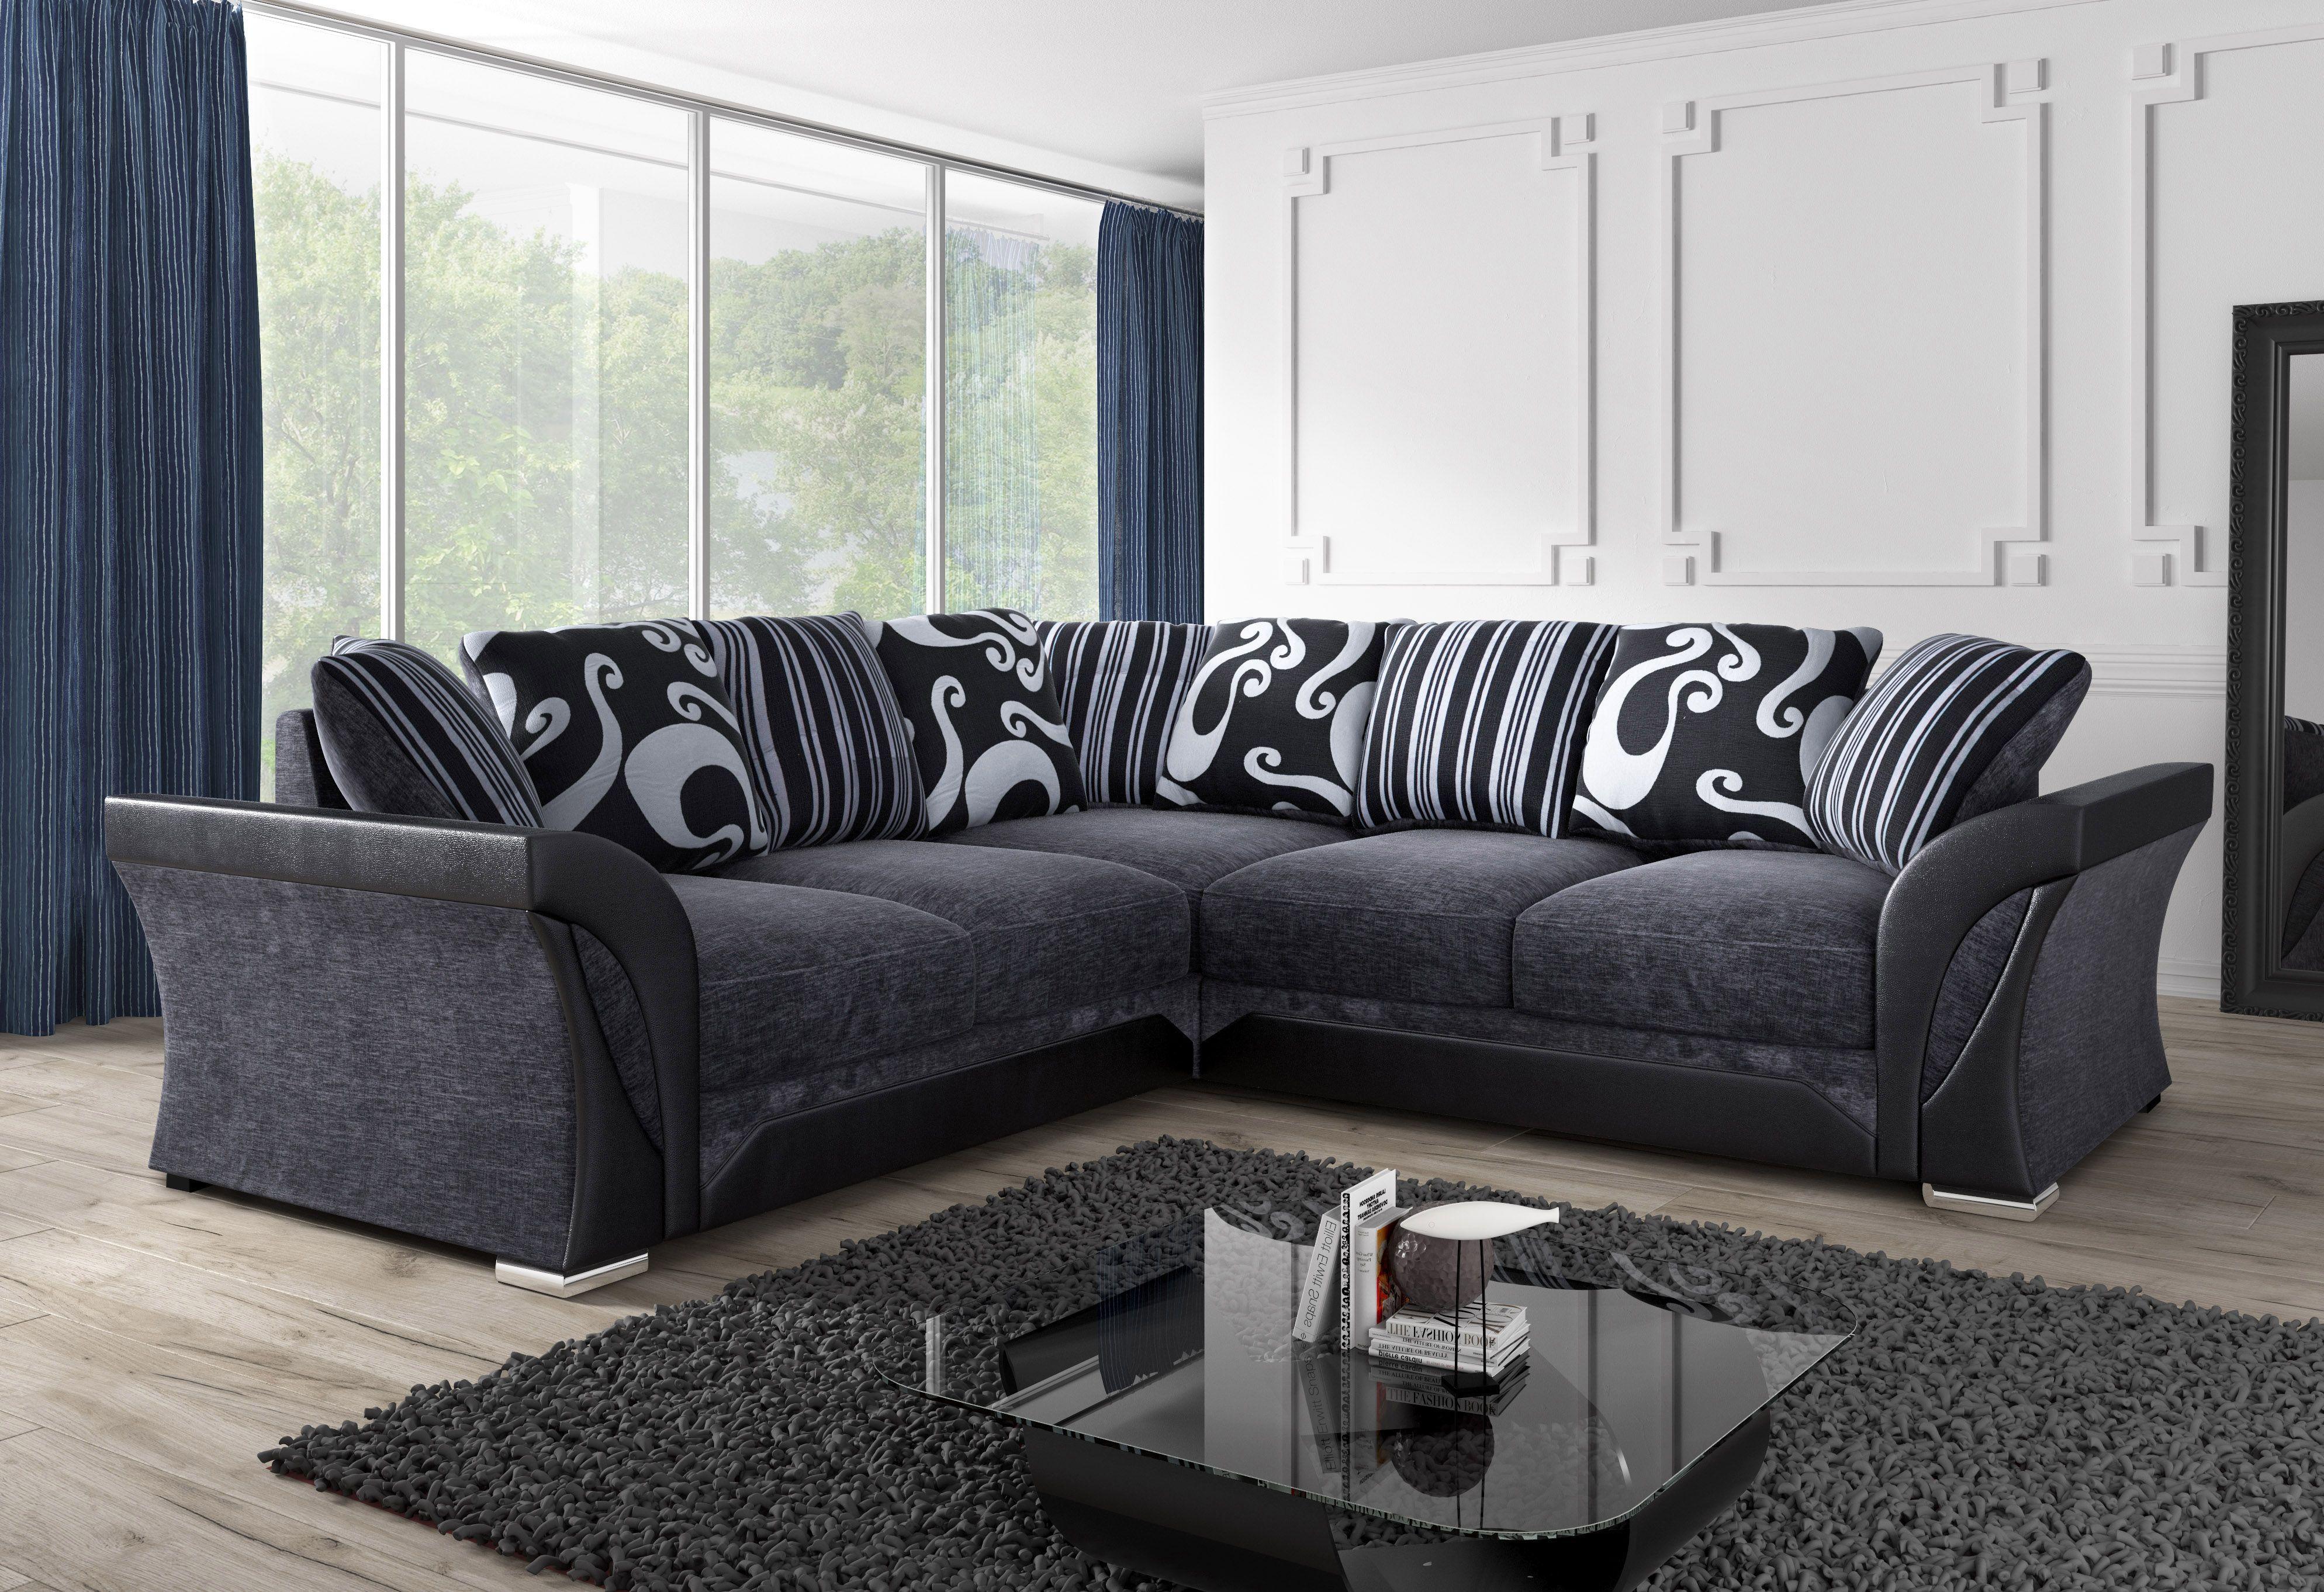 Shannon 2c2 Corner Sofa Grey Black 499 Black Corner Sofa Leather Corner Sofa Black And Grey Corner Sofa